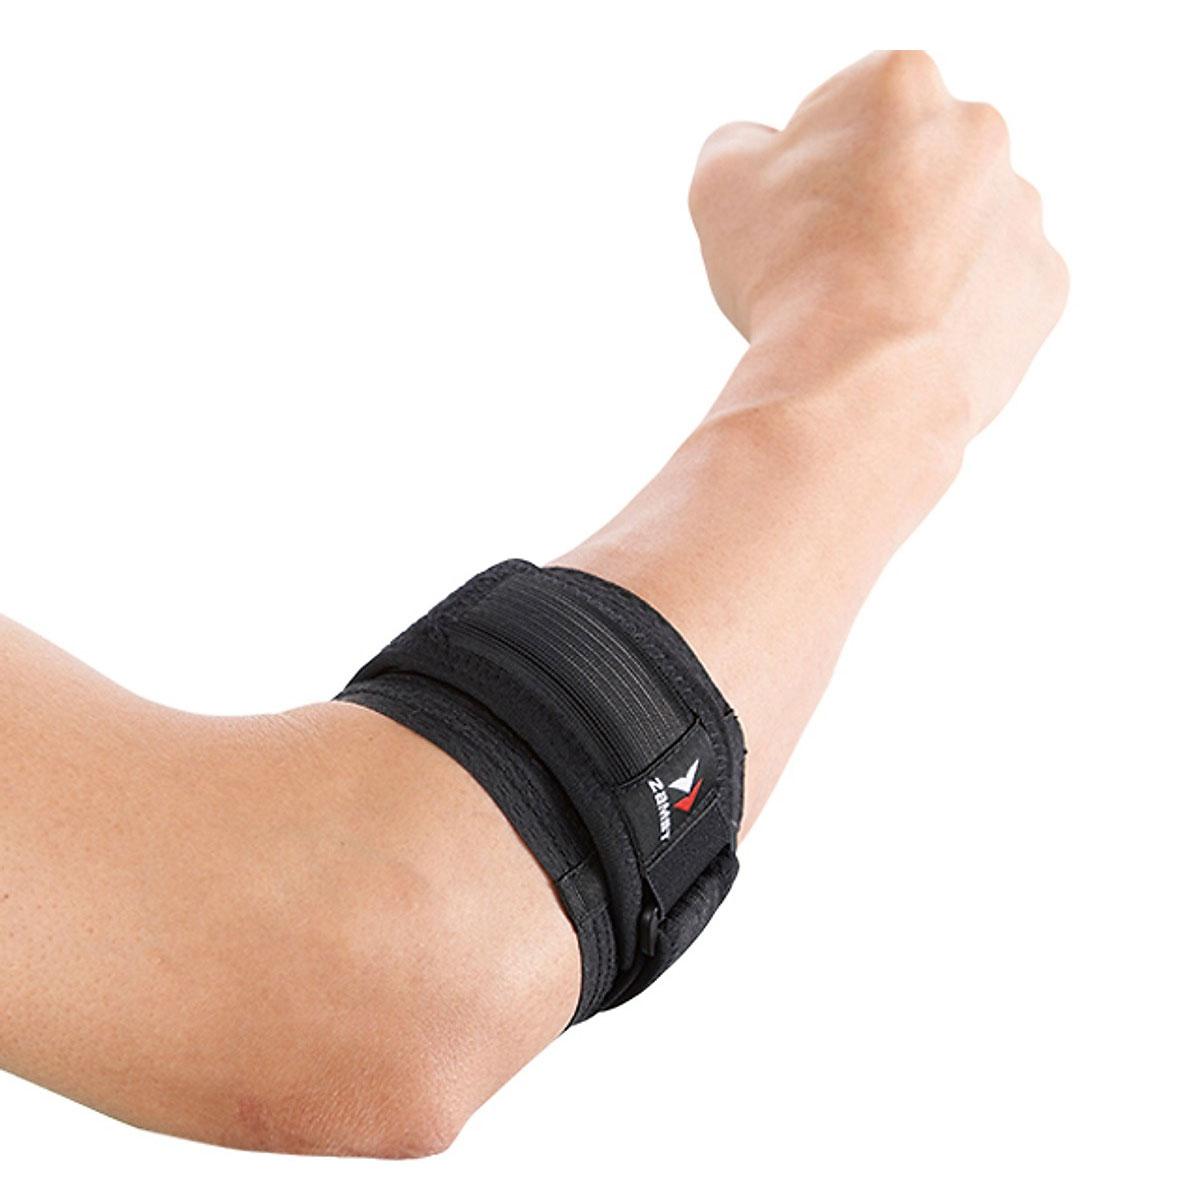 Băng bảo vệ khuỷu tay ZAMST Elbow Band